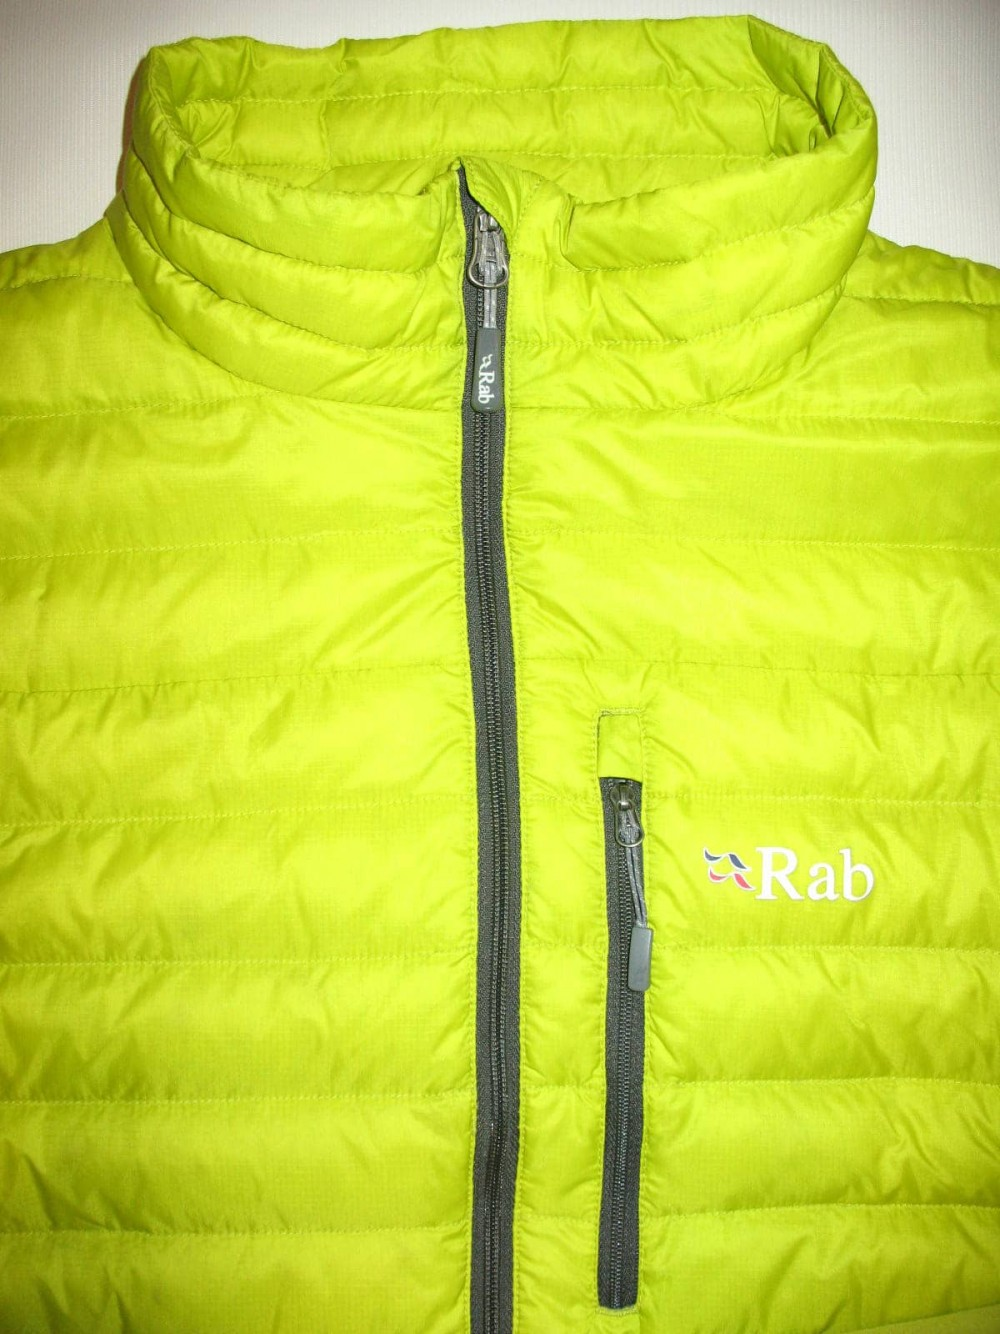 Куртка RAB microlight jacket (размер XXL/XXXL) - 1